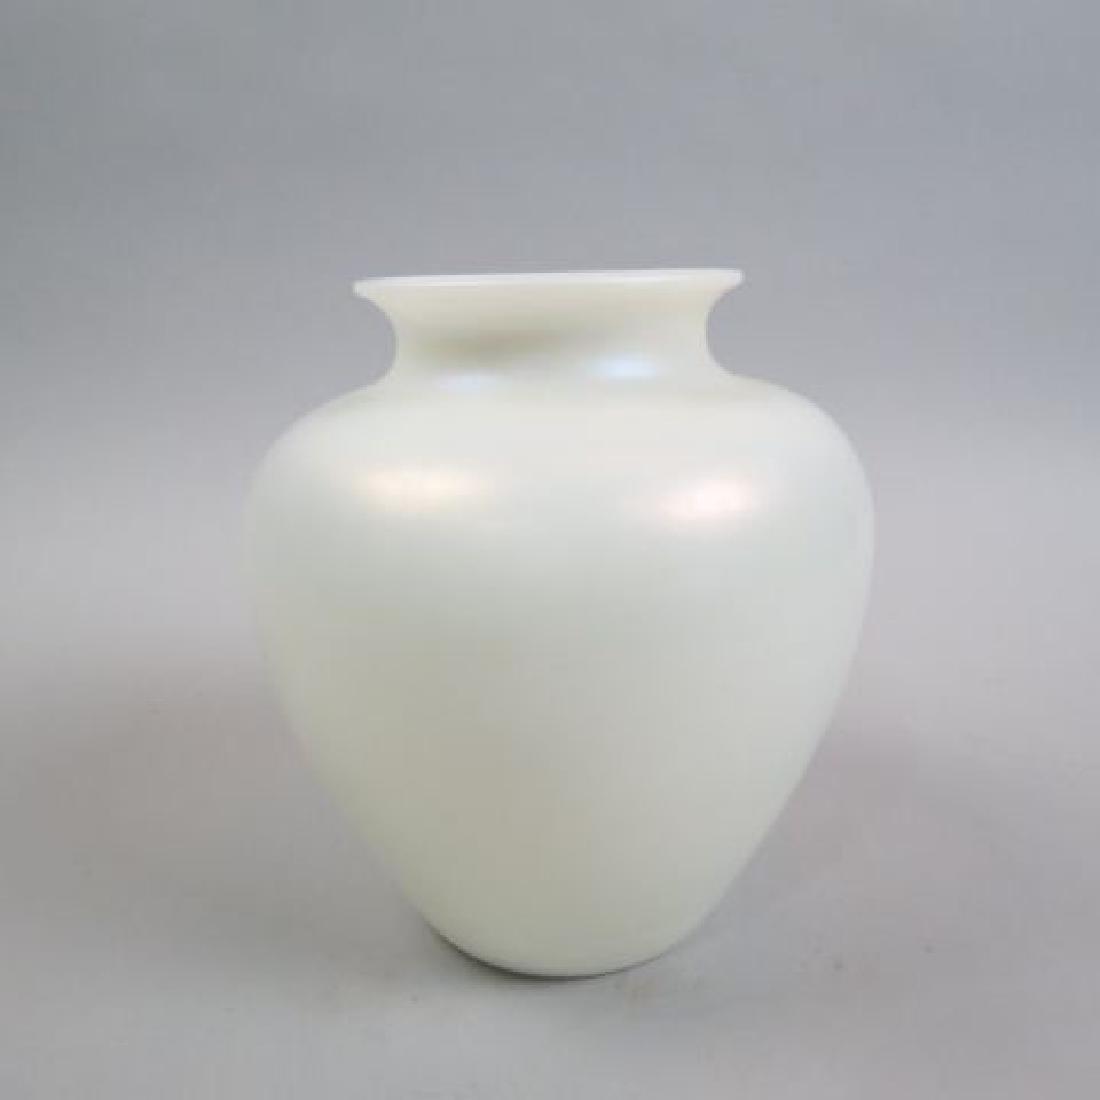 Steuben Art Glass Vase,